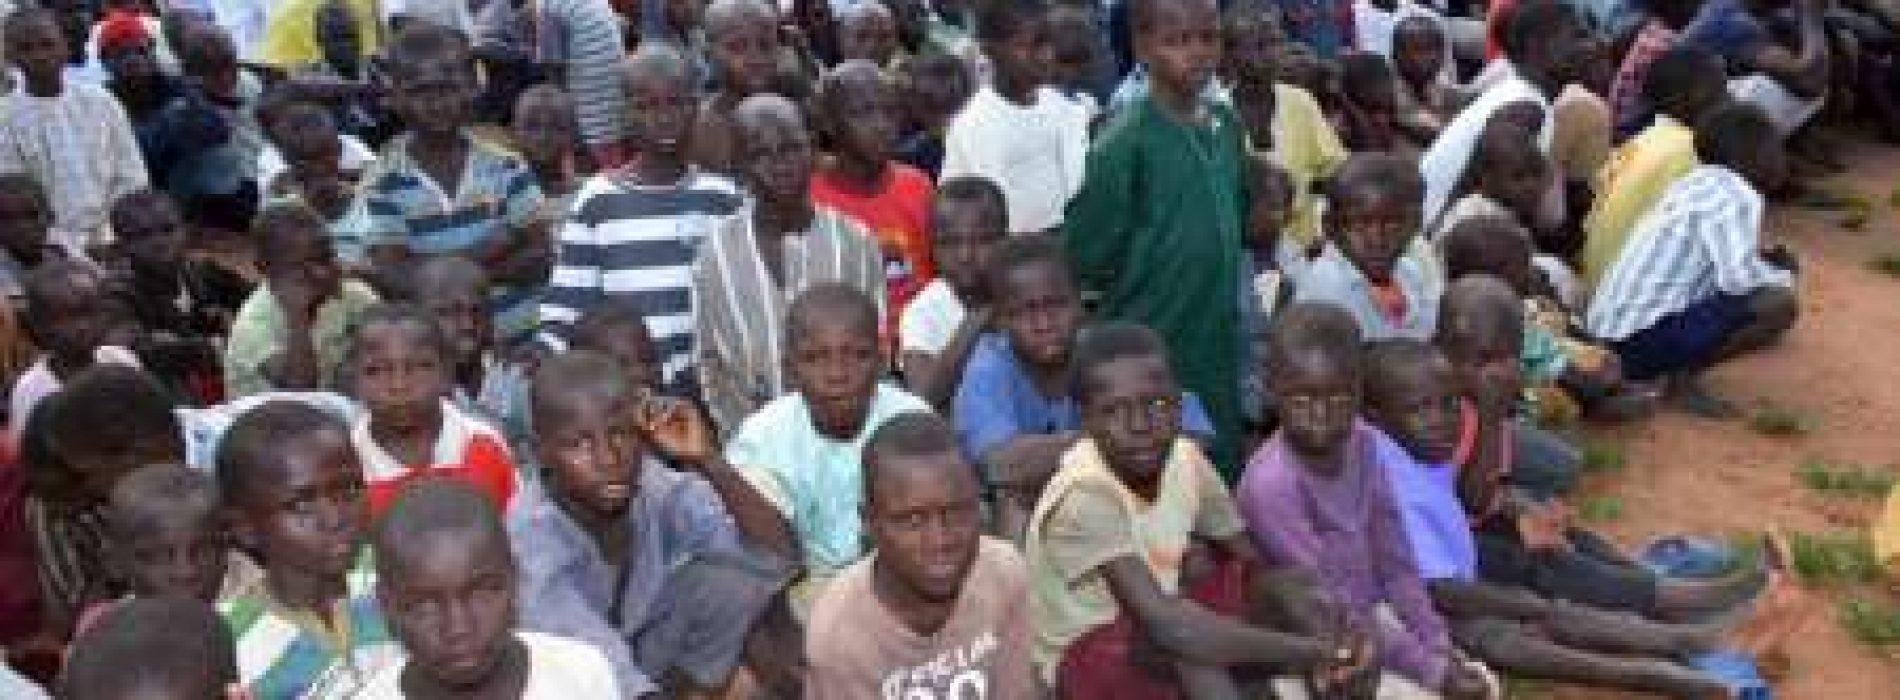 Boko Haram killed 3,900 children, maim 7,300 in 4yrs, says UN